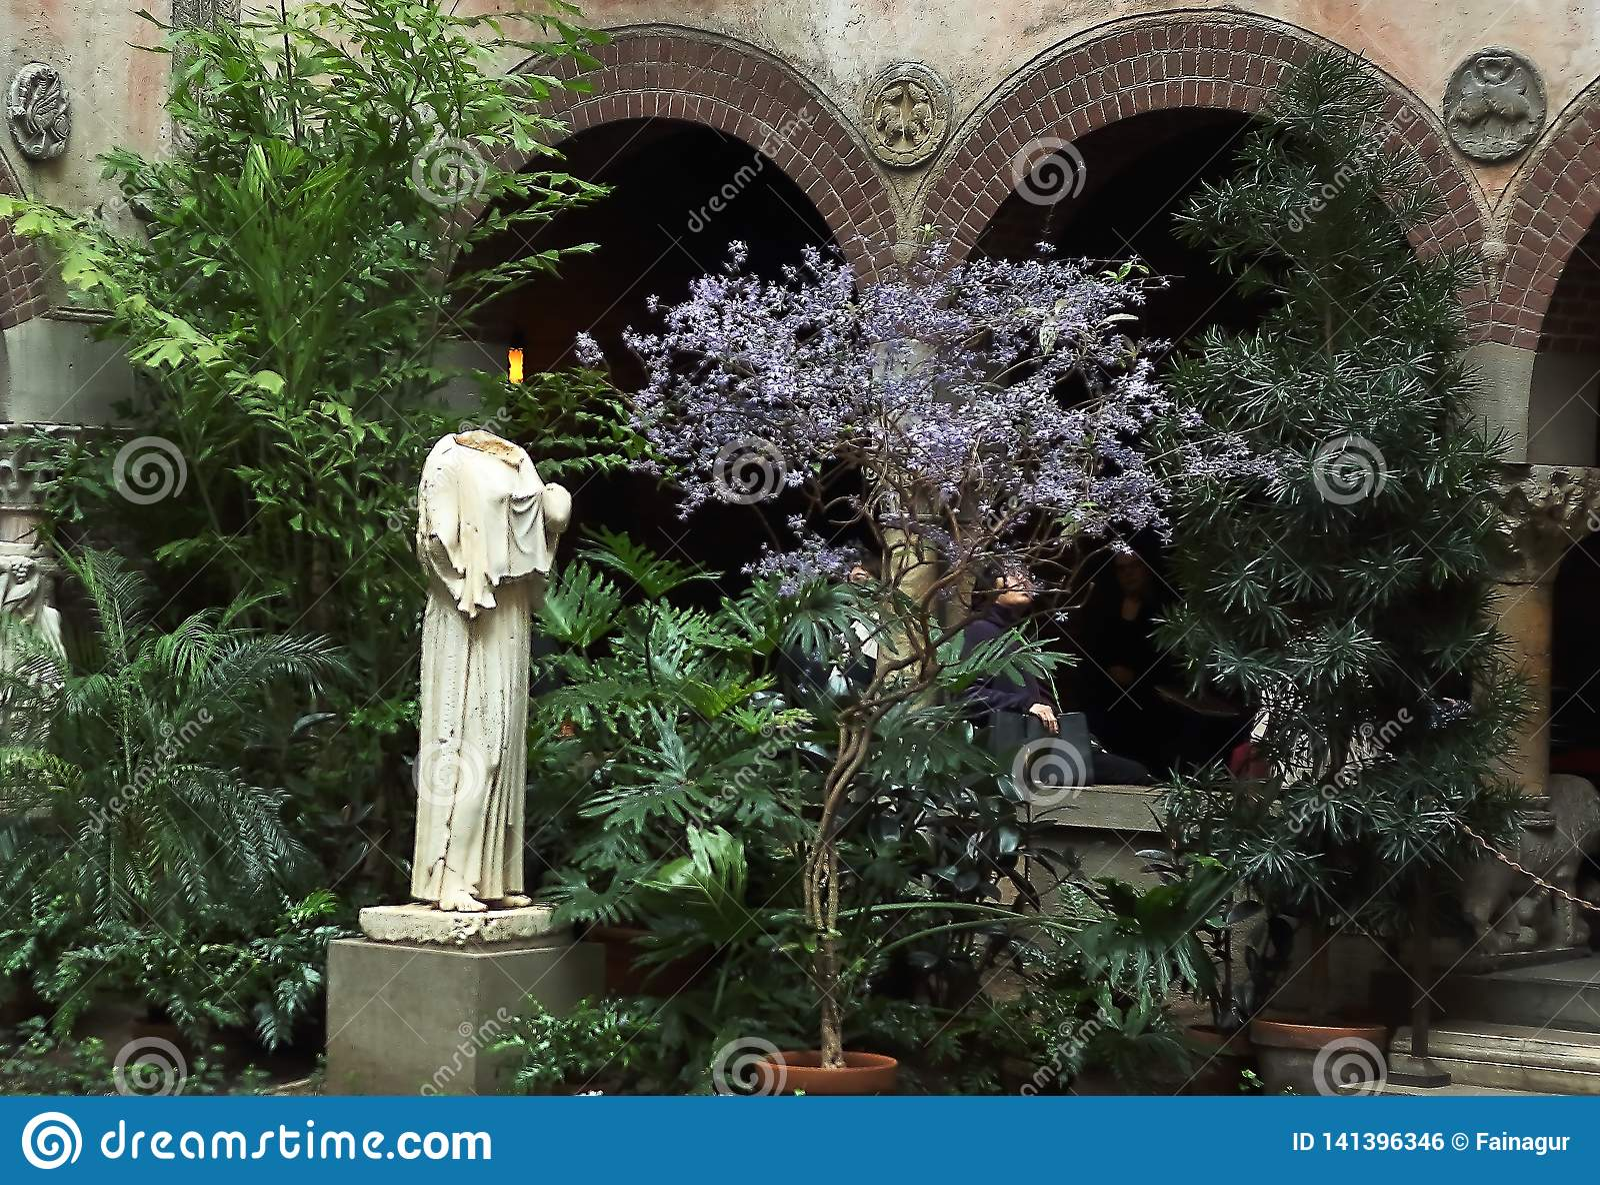 Antique statue of Roman goddess Peplophoros in the Isabella Stewart Gardner Museum, Fenway park, Boston, Massachusetts